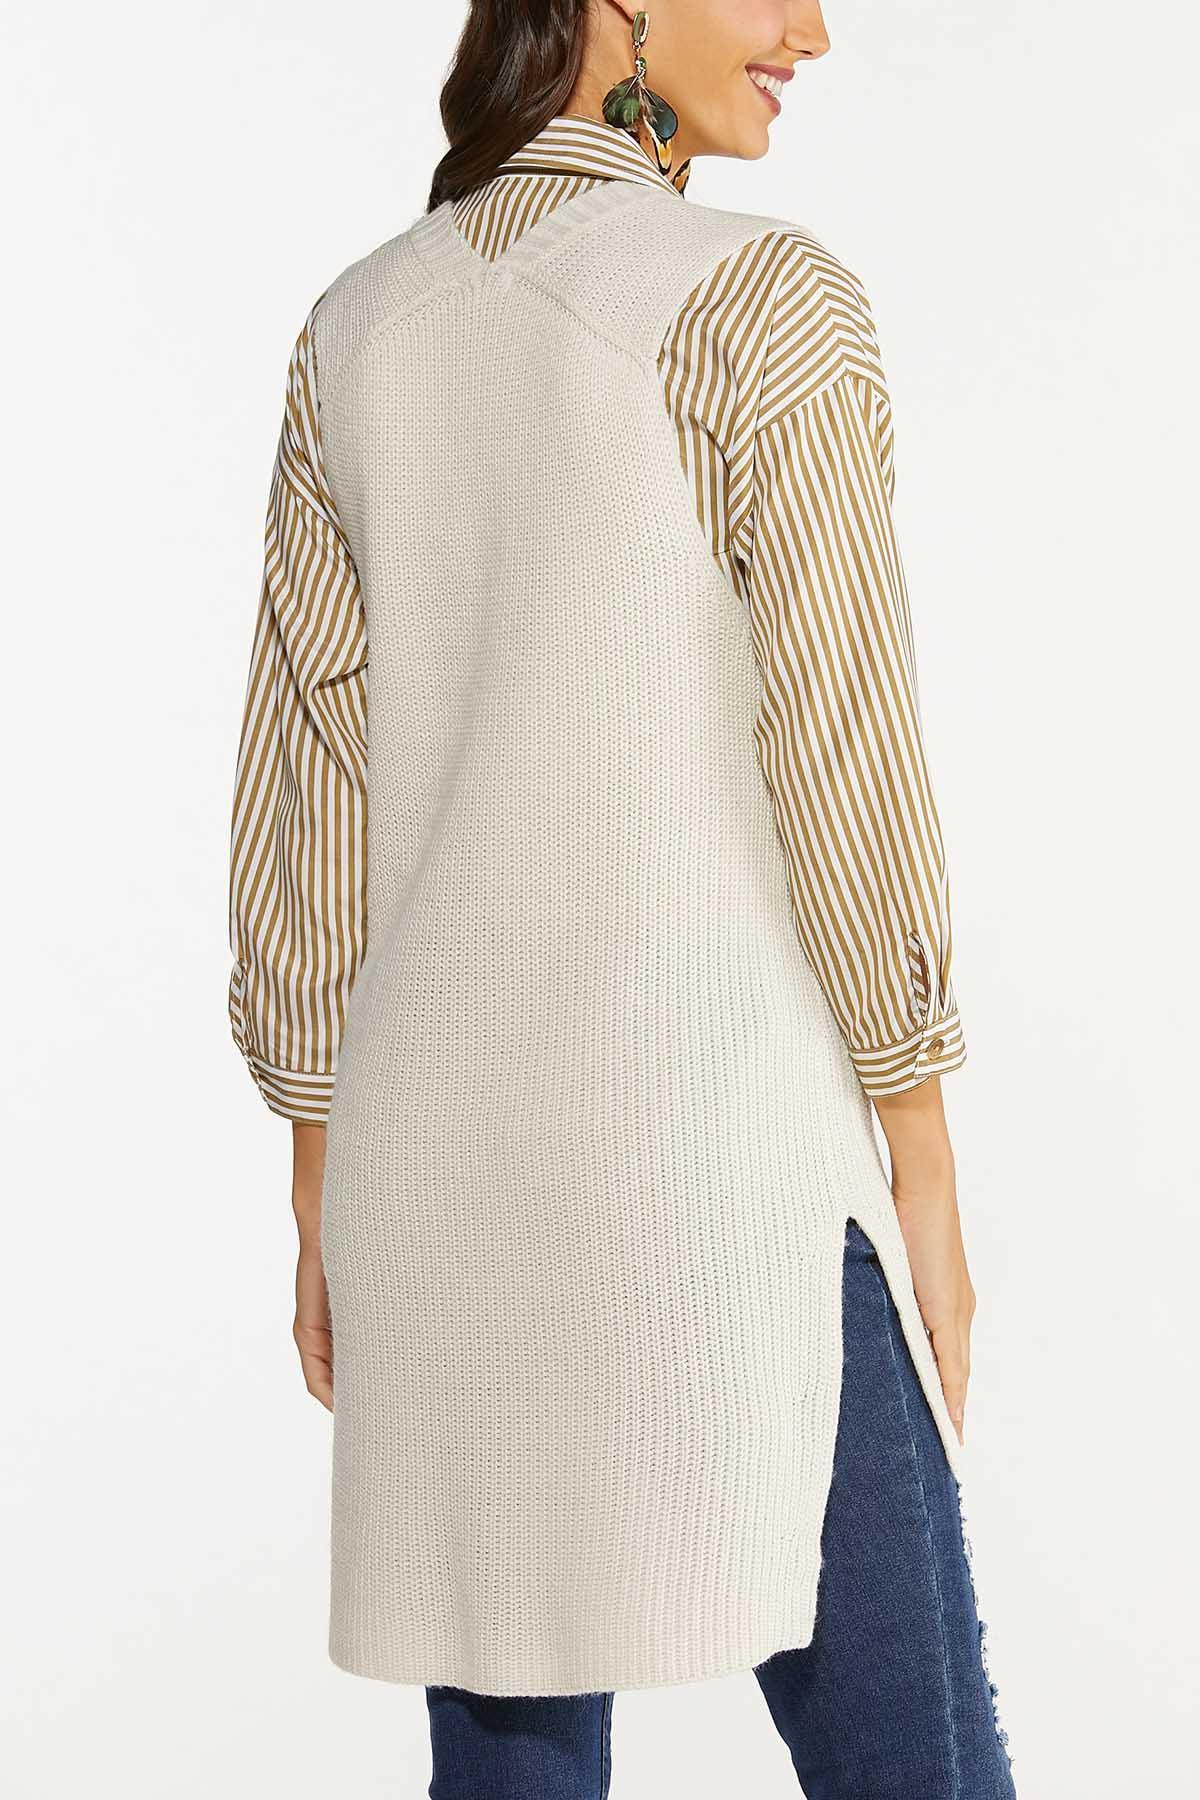 Plus Size Pullover Sweater Vest (Item #44656989)